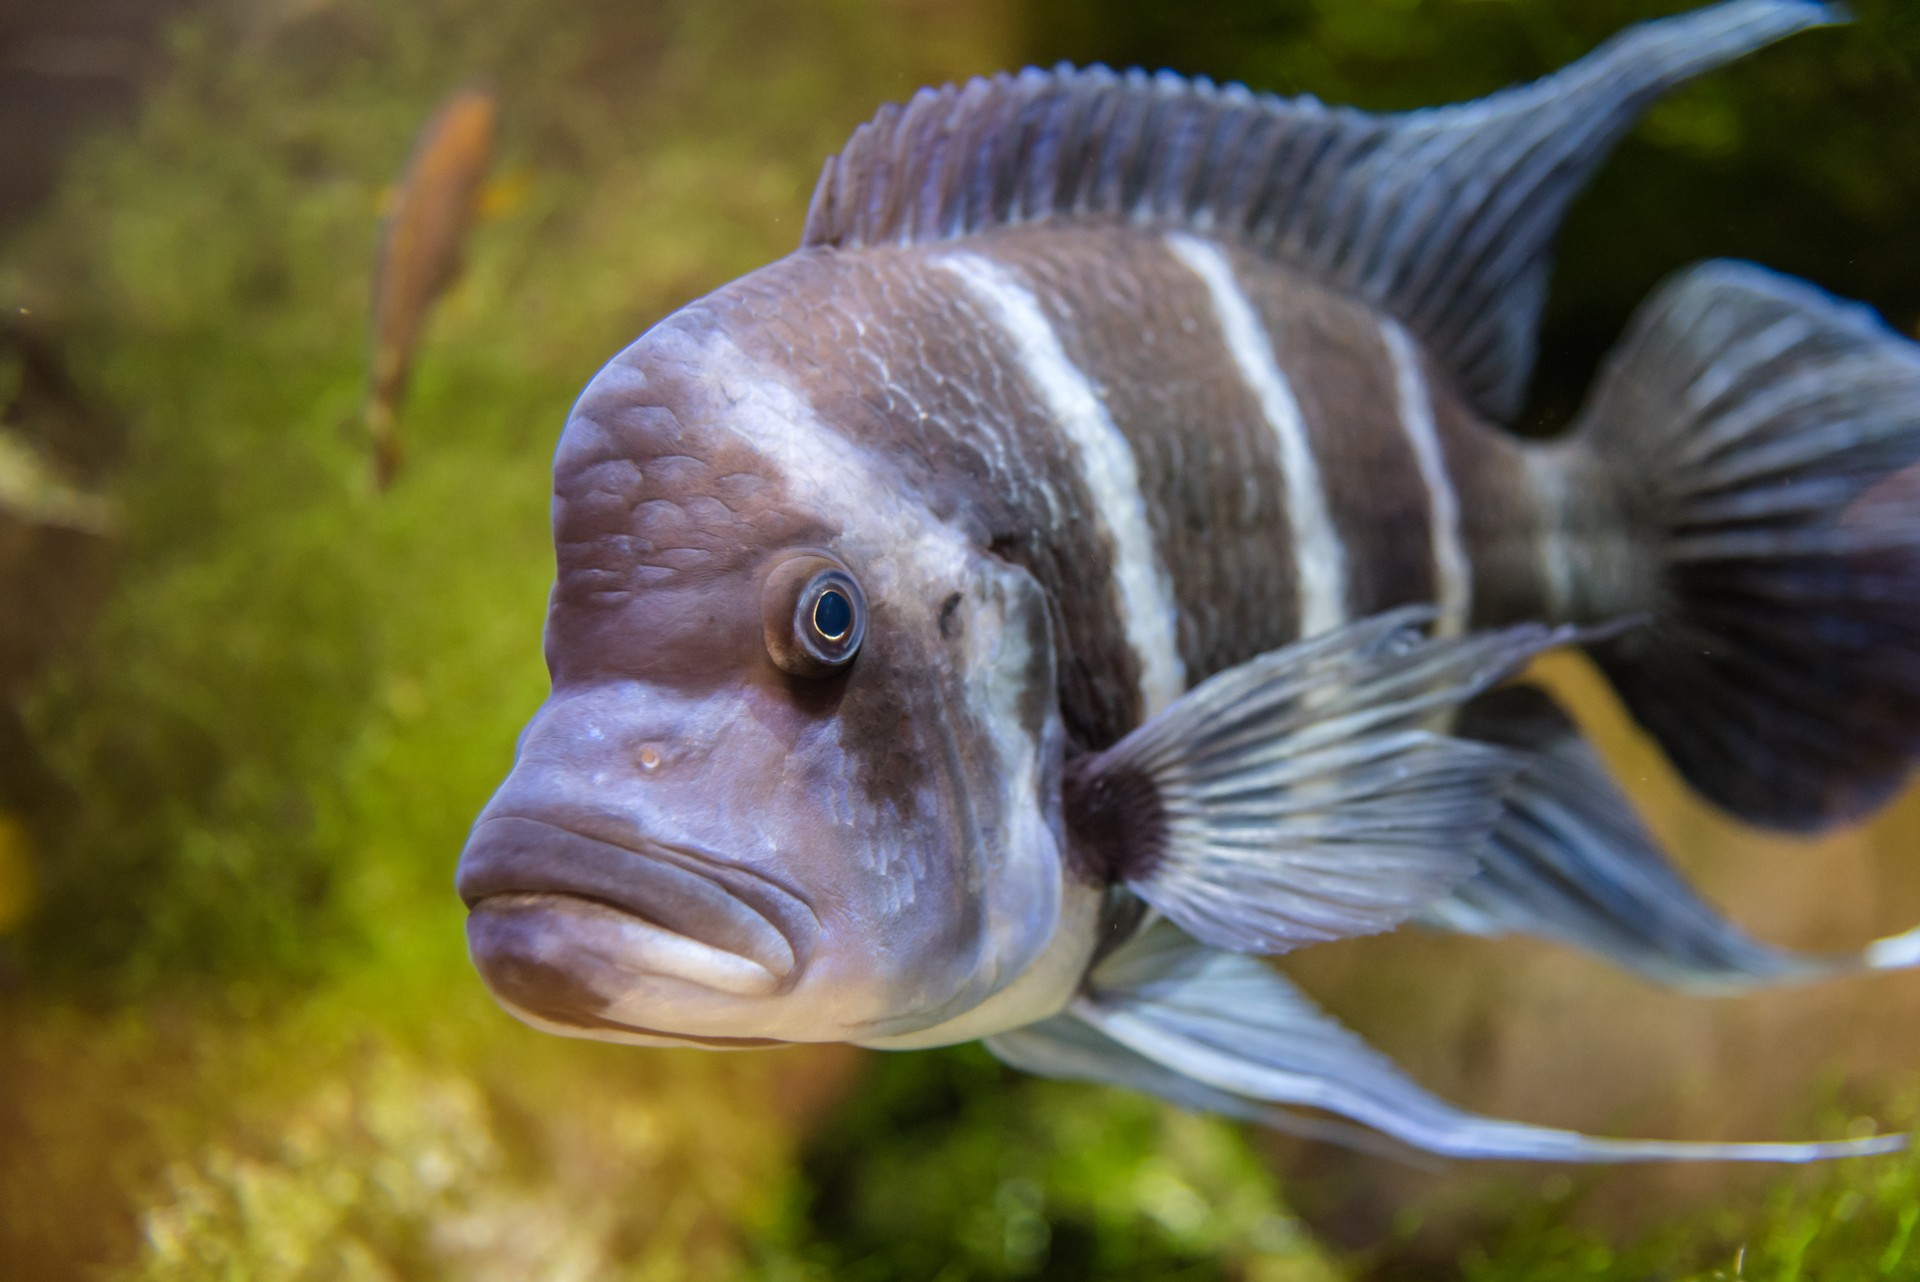 Wildlife of Zambia: Humphead cichlid